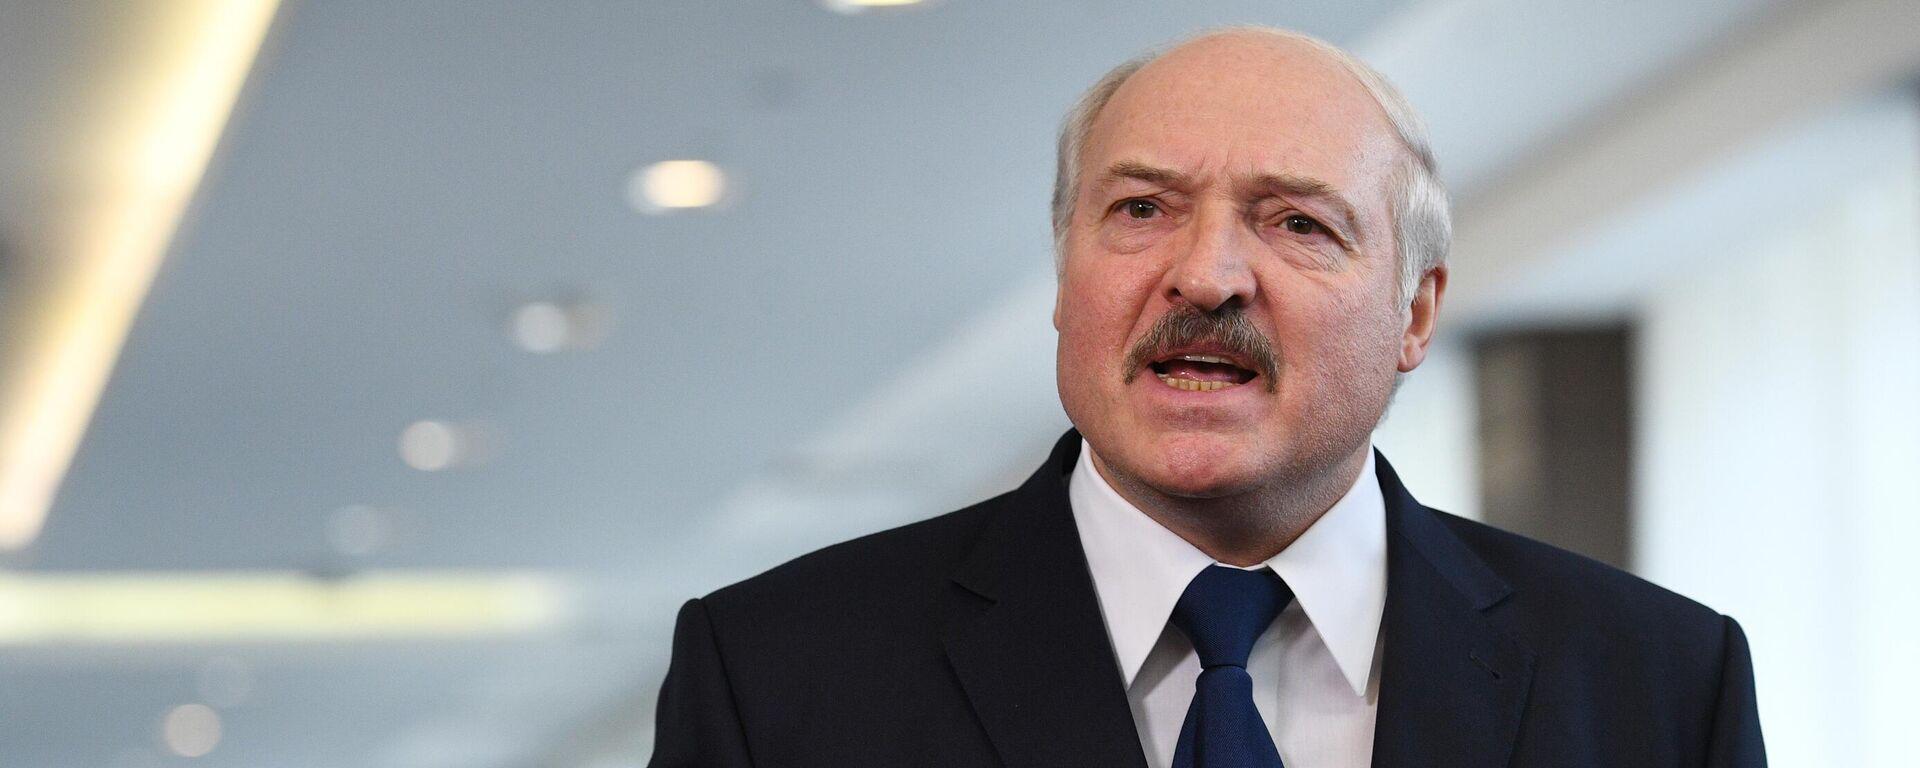 Президент Белоруссии Александр Лукашенко - Sputnik Таджикистан, 1920, 05.08.2021